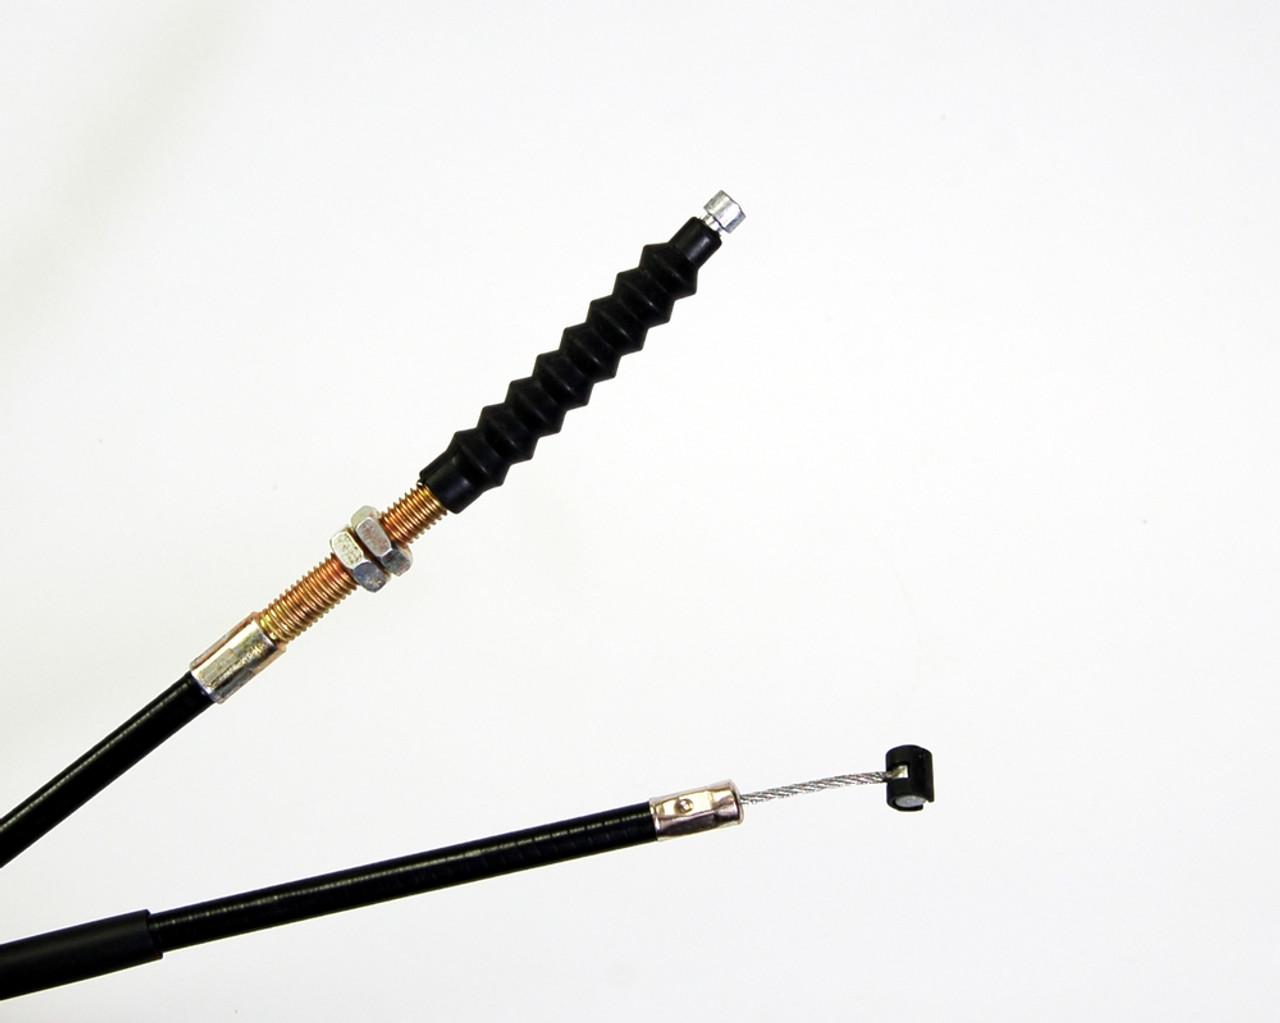 Clutch Cable Kawasaki ZX6R ZX 6R (2005-2006)